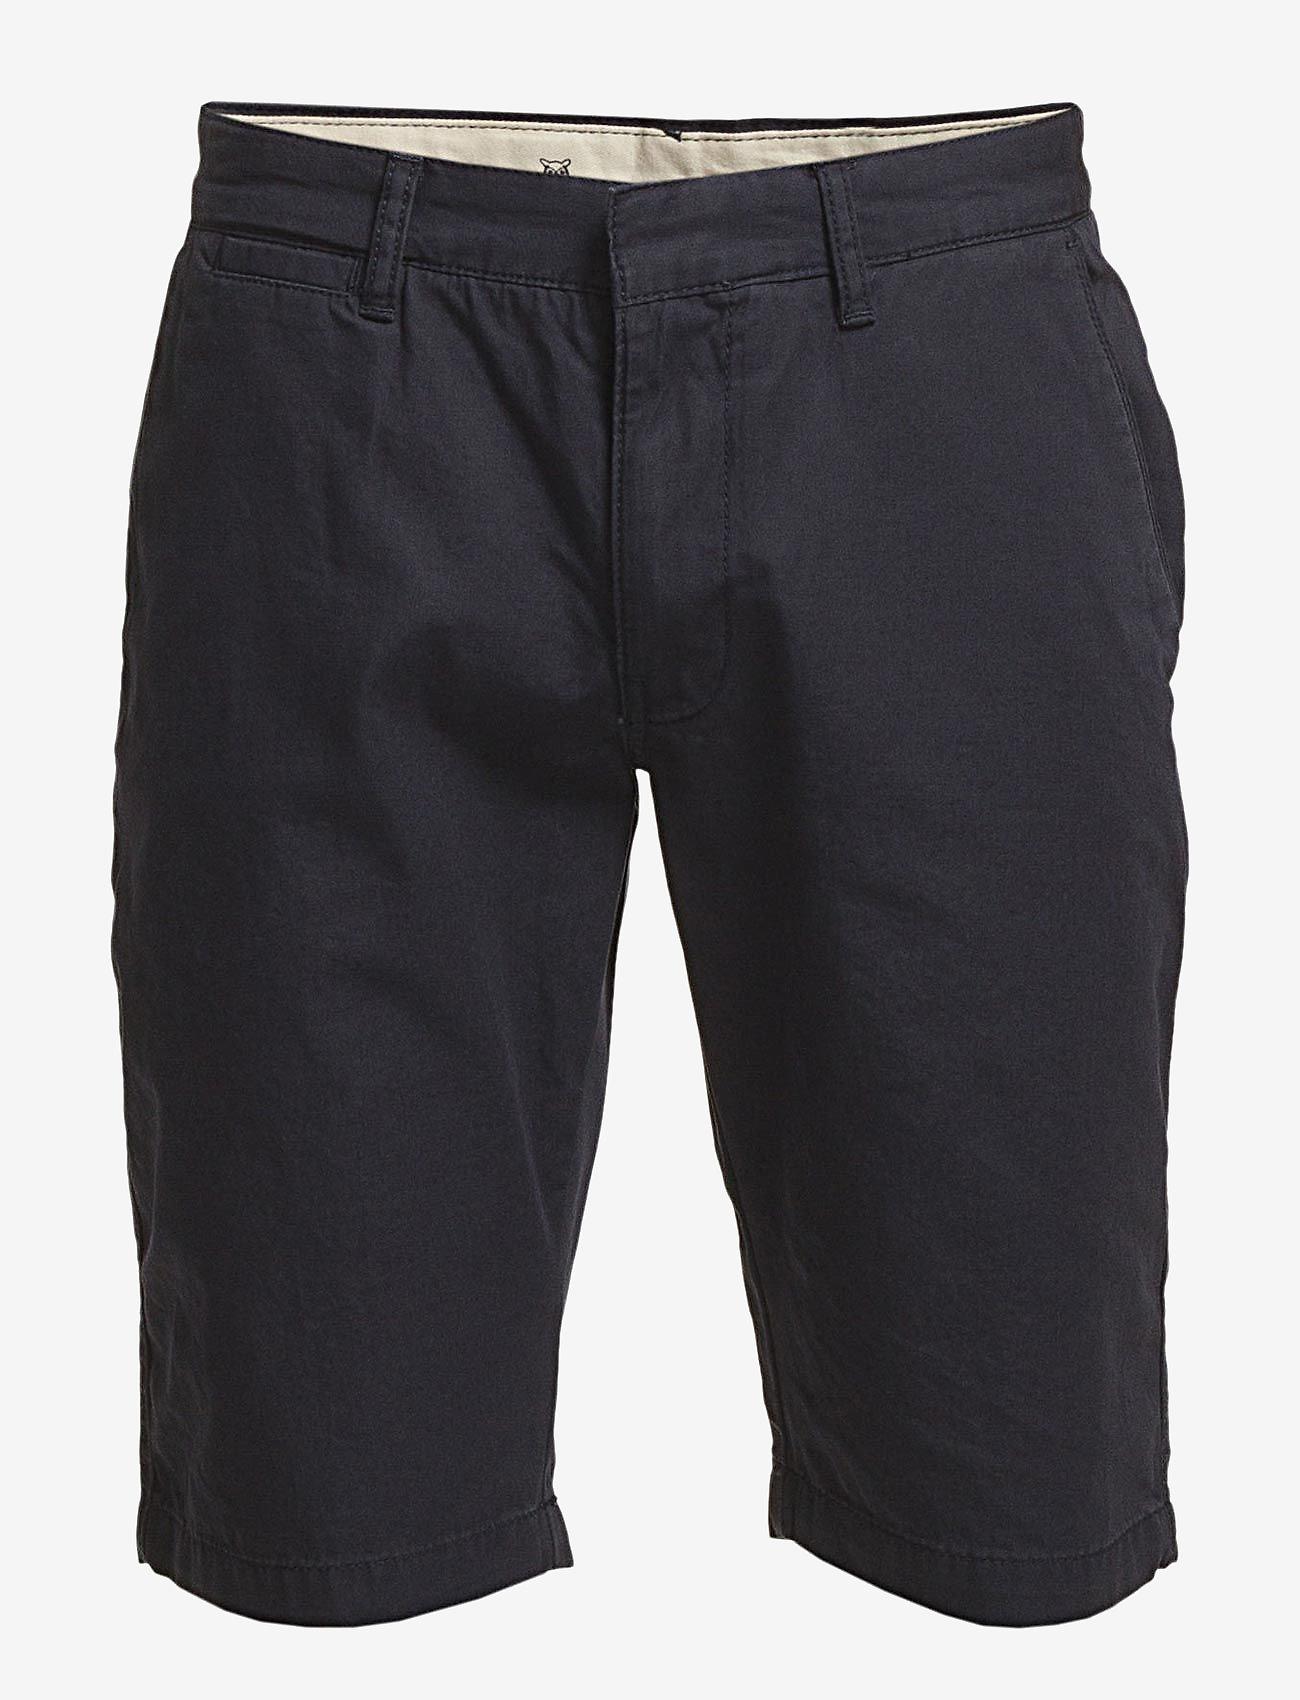 Knowledge Cotton Apparel - CHUCK chino shorts - apģērbs - total eclipse - 0